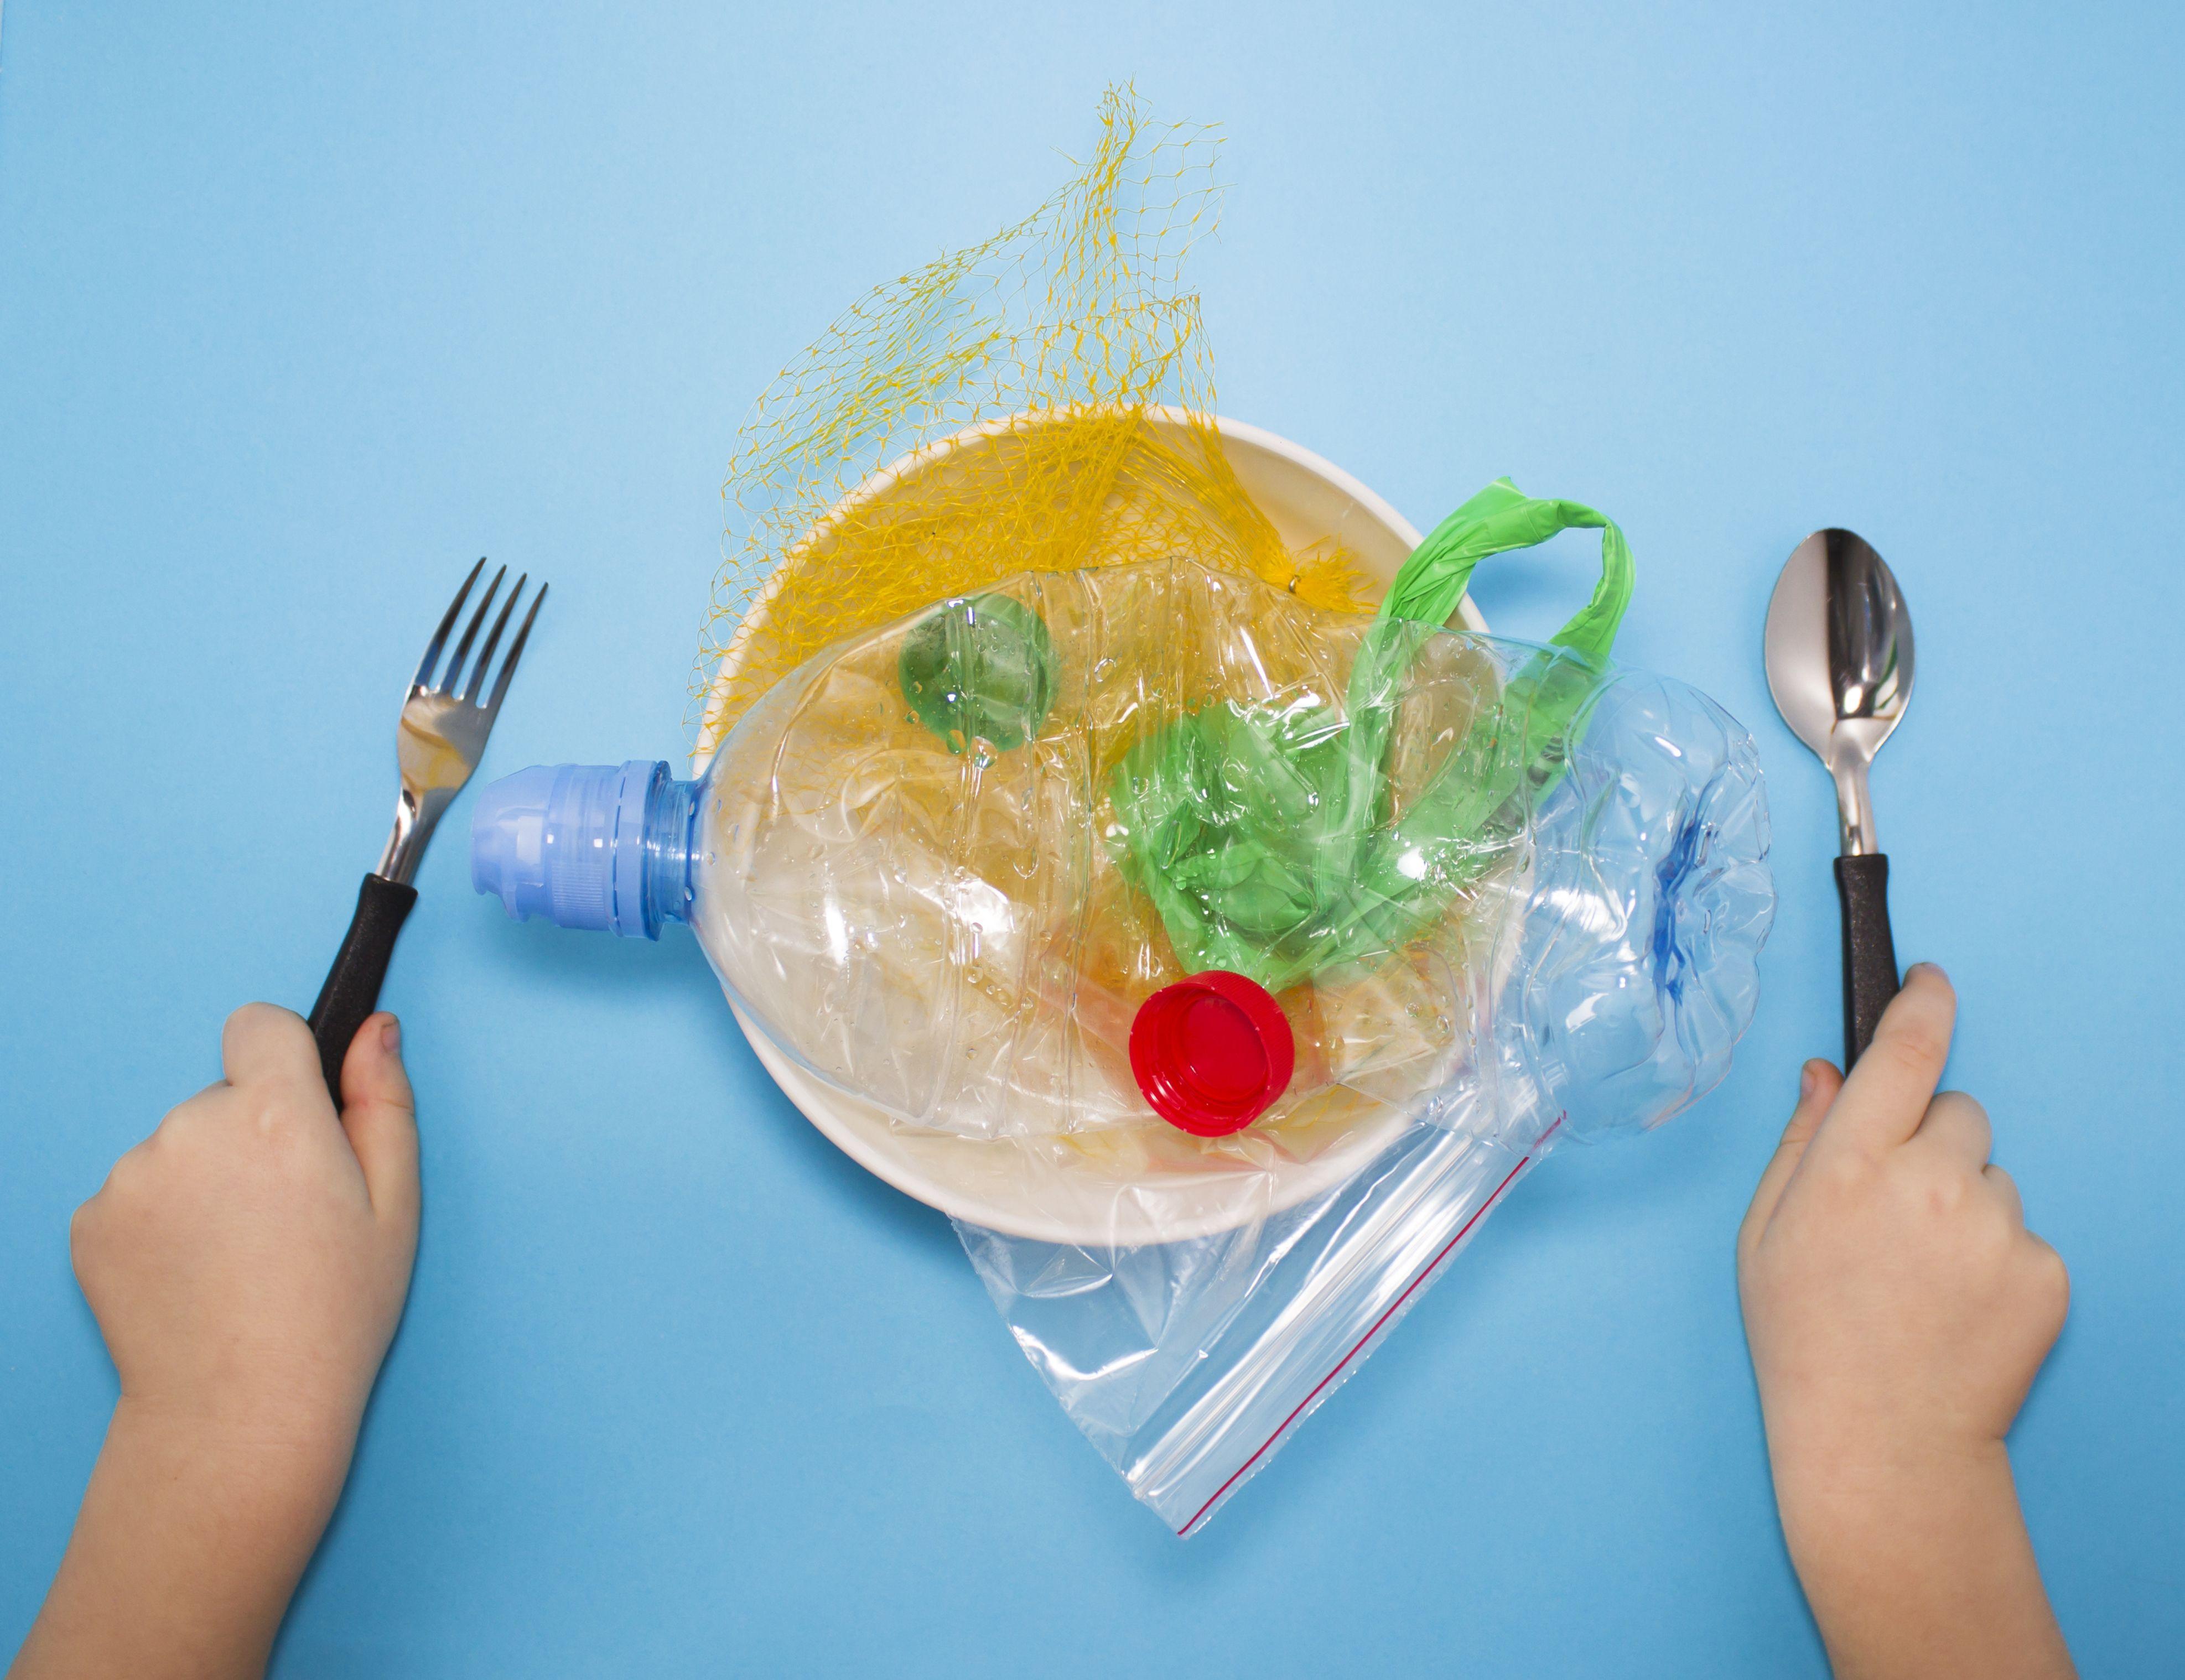 Orinamos plástico a diario